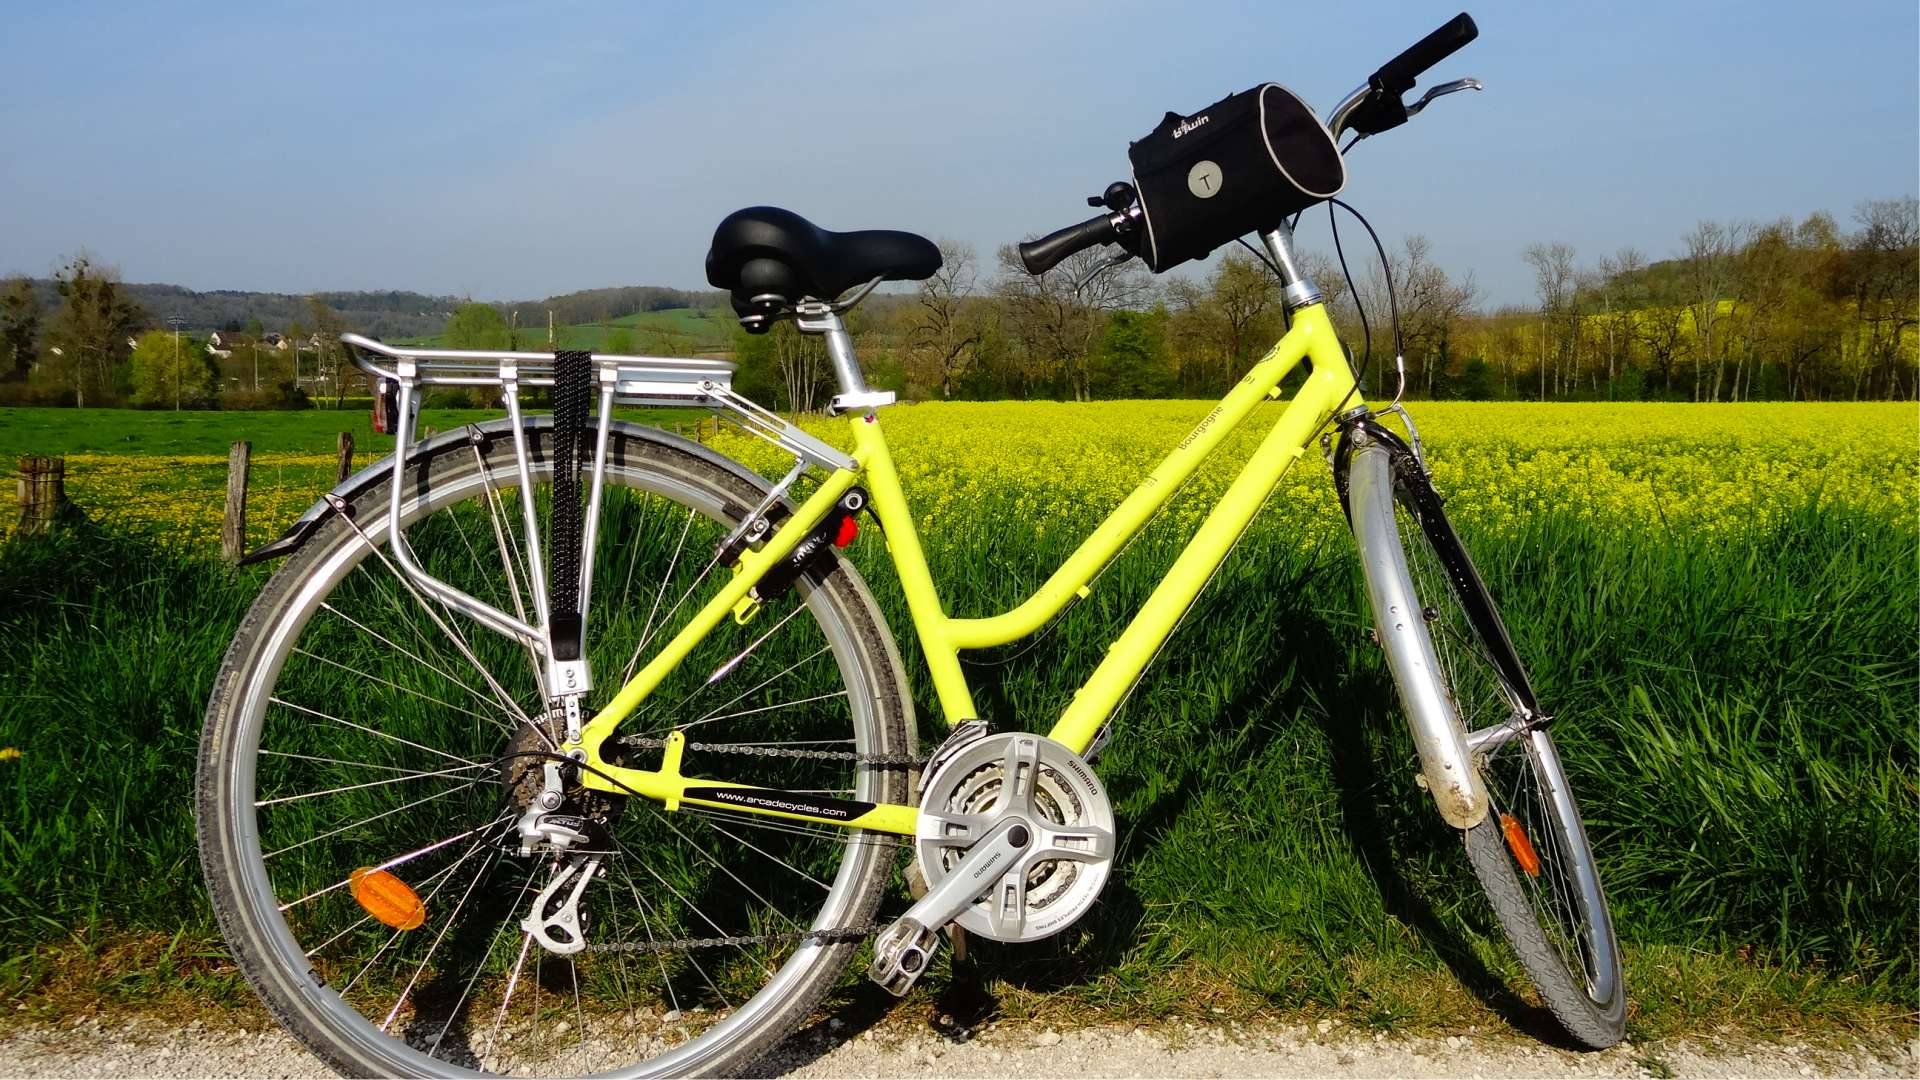 Cyclistes dans un vignoble